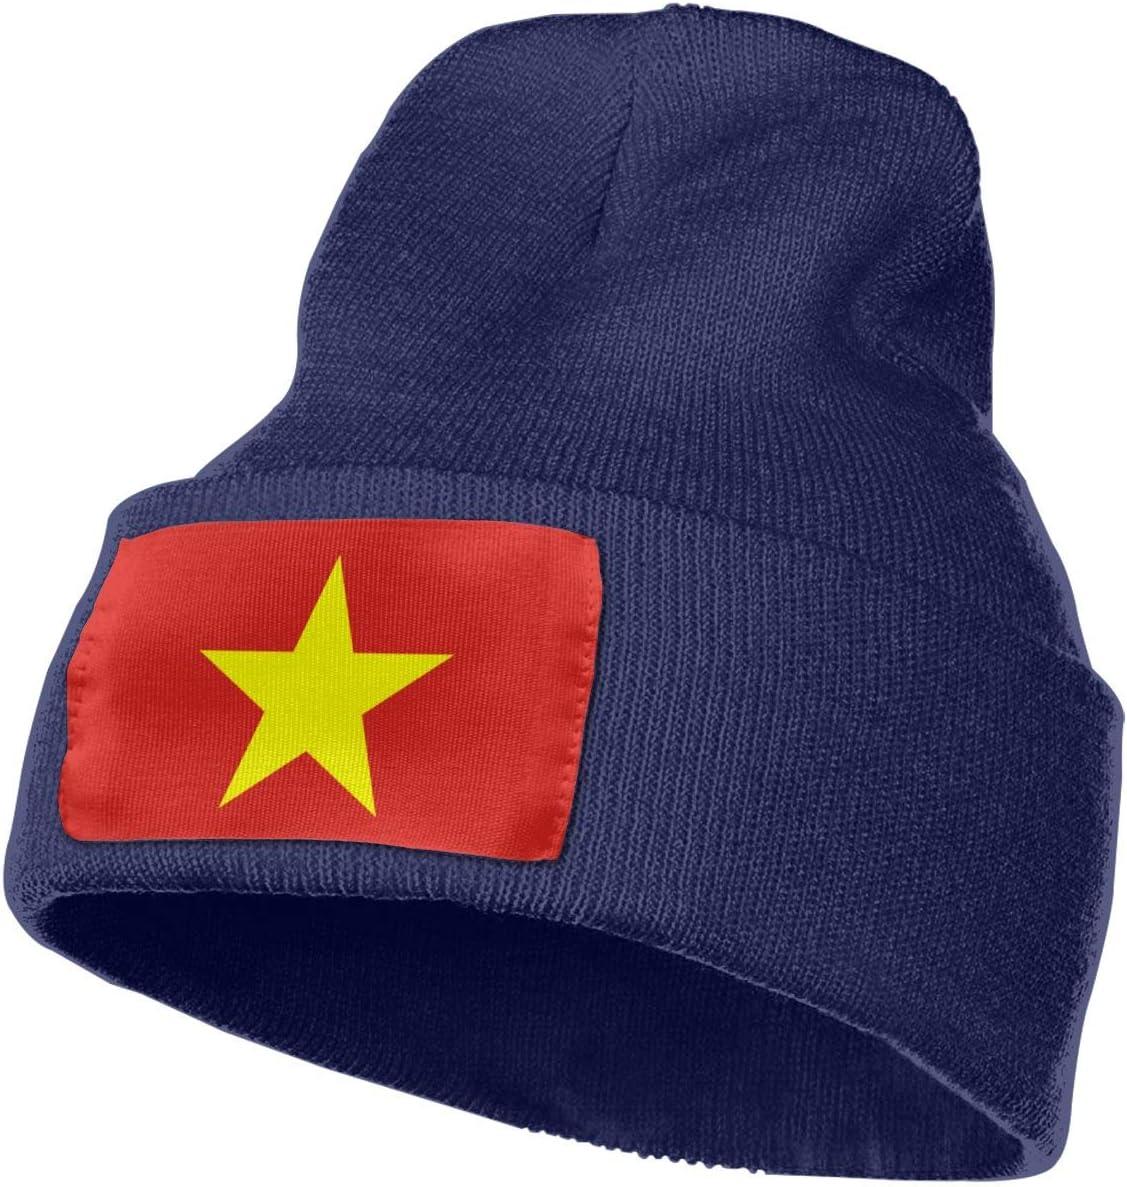 Thick Warm /& Stylish Winter Hats Black MACA Vietnam Unisex Slouch Beanie Hats